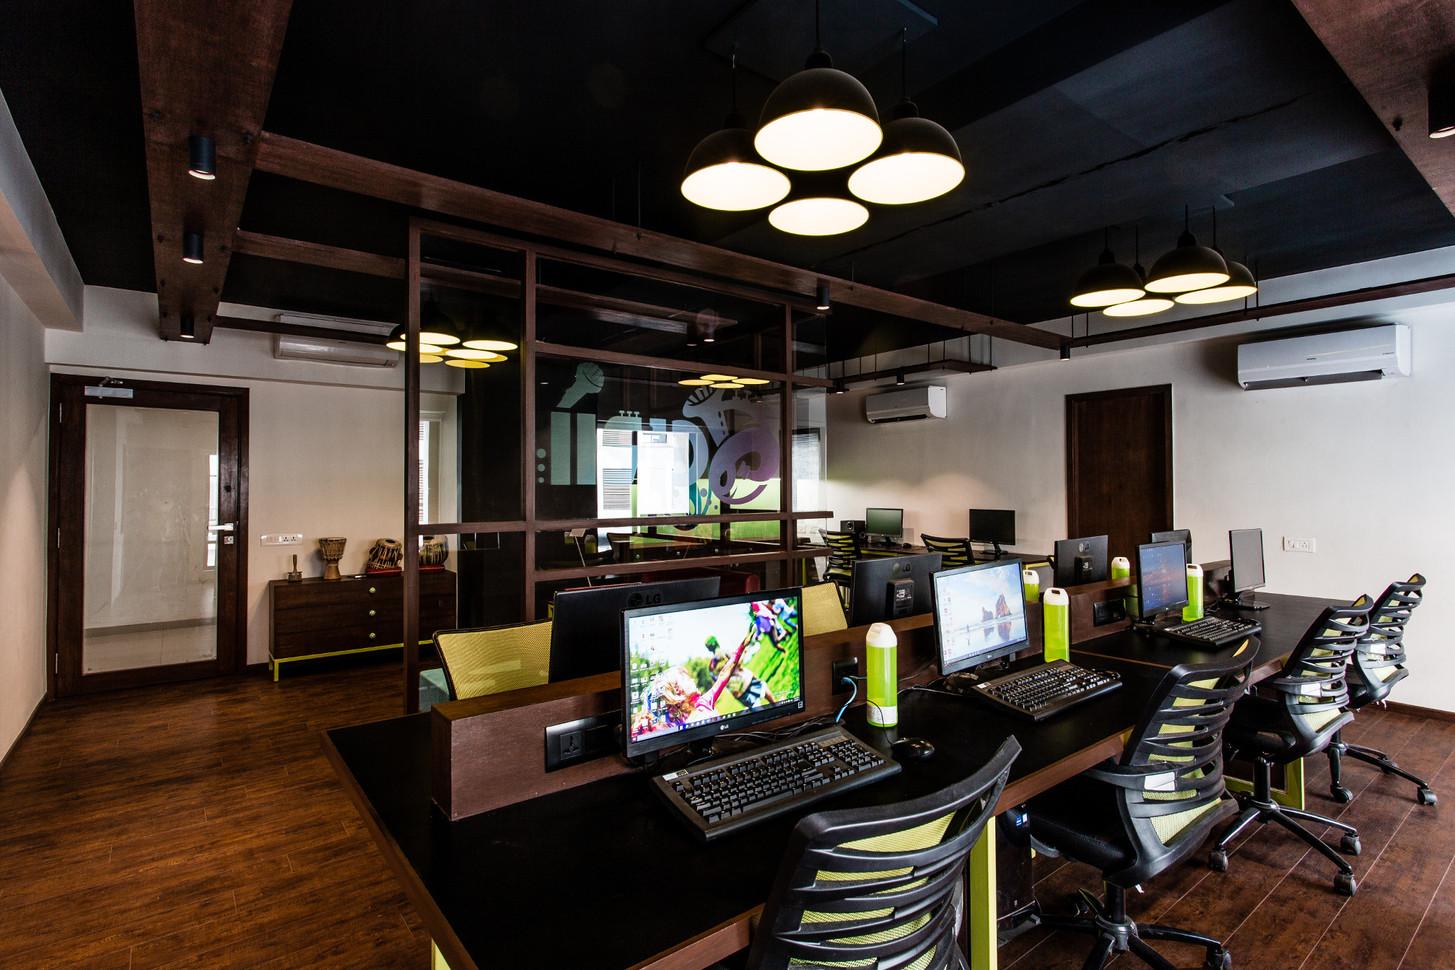 Music Studio_View of Work area.jpg